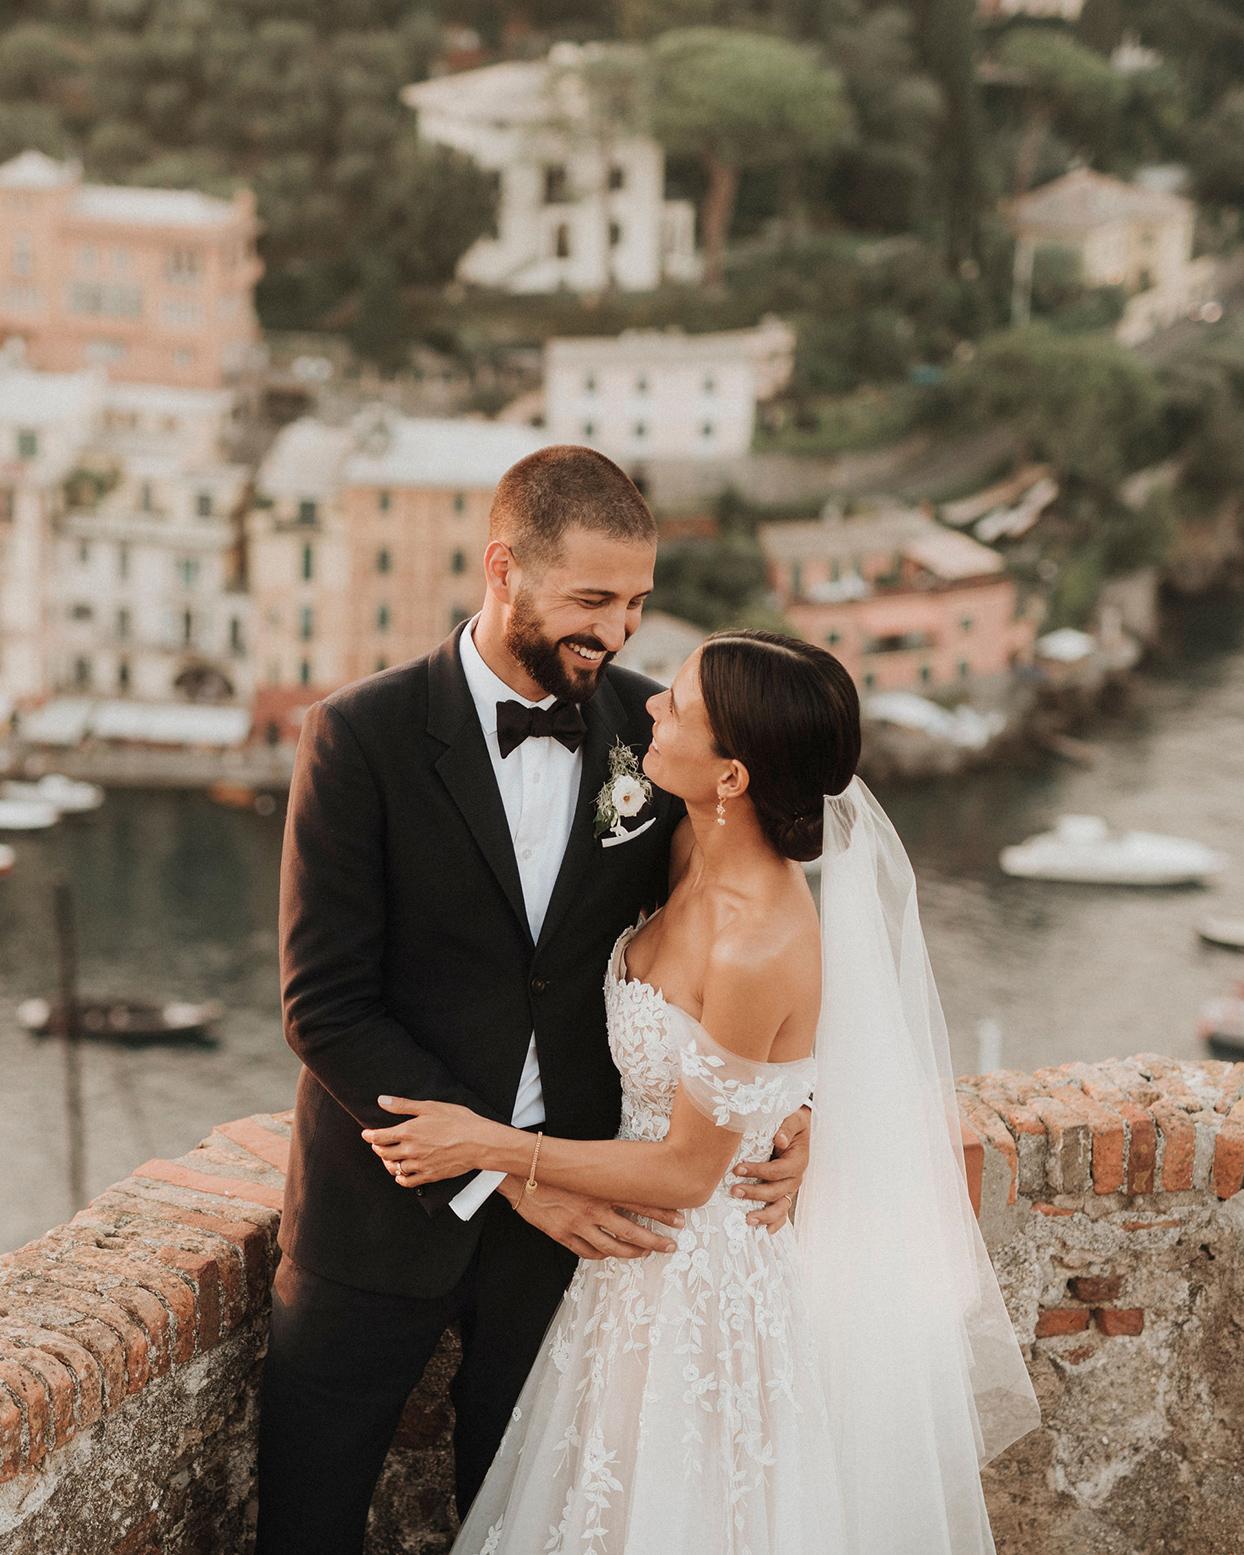 jaclyn antonio wedding couple against brick balcony